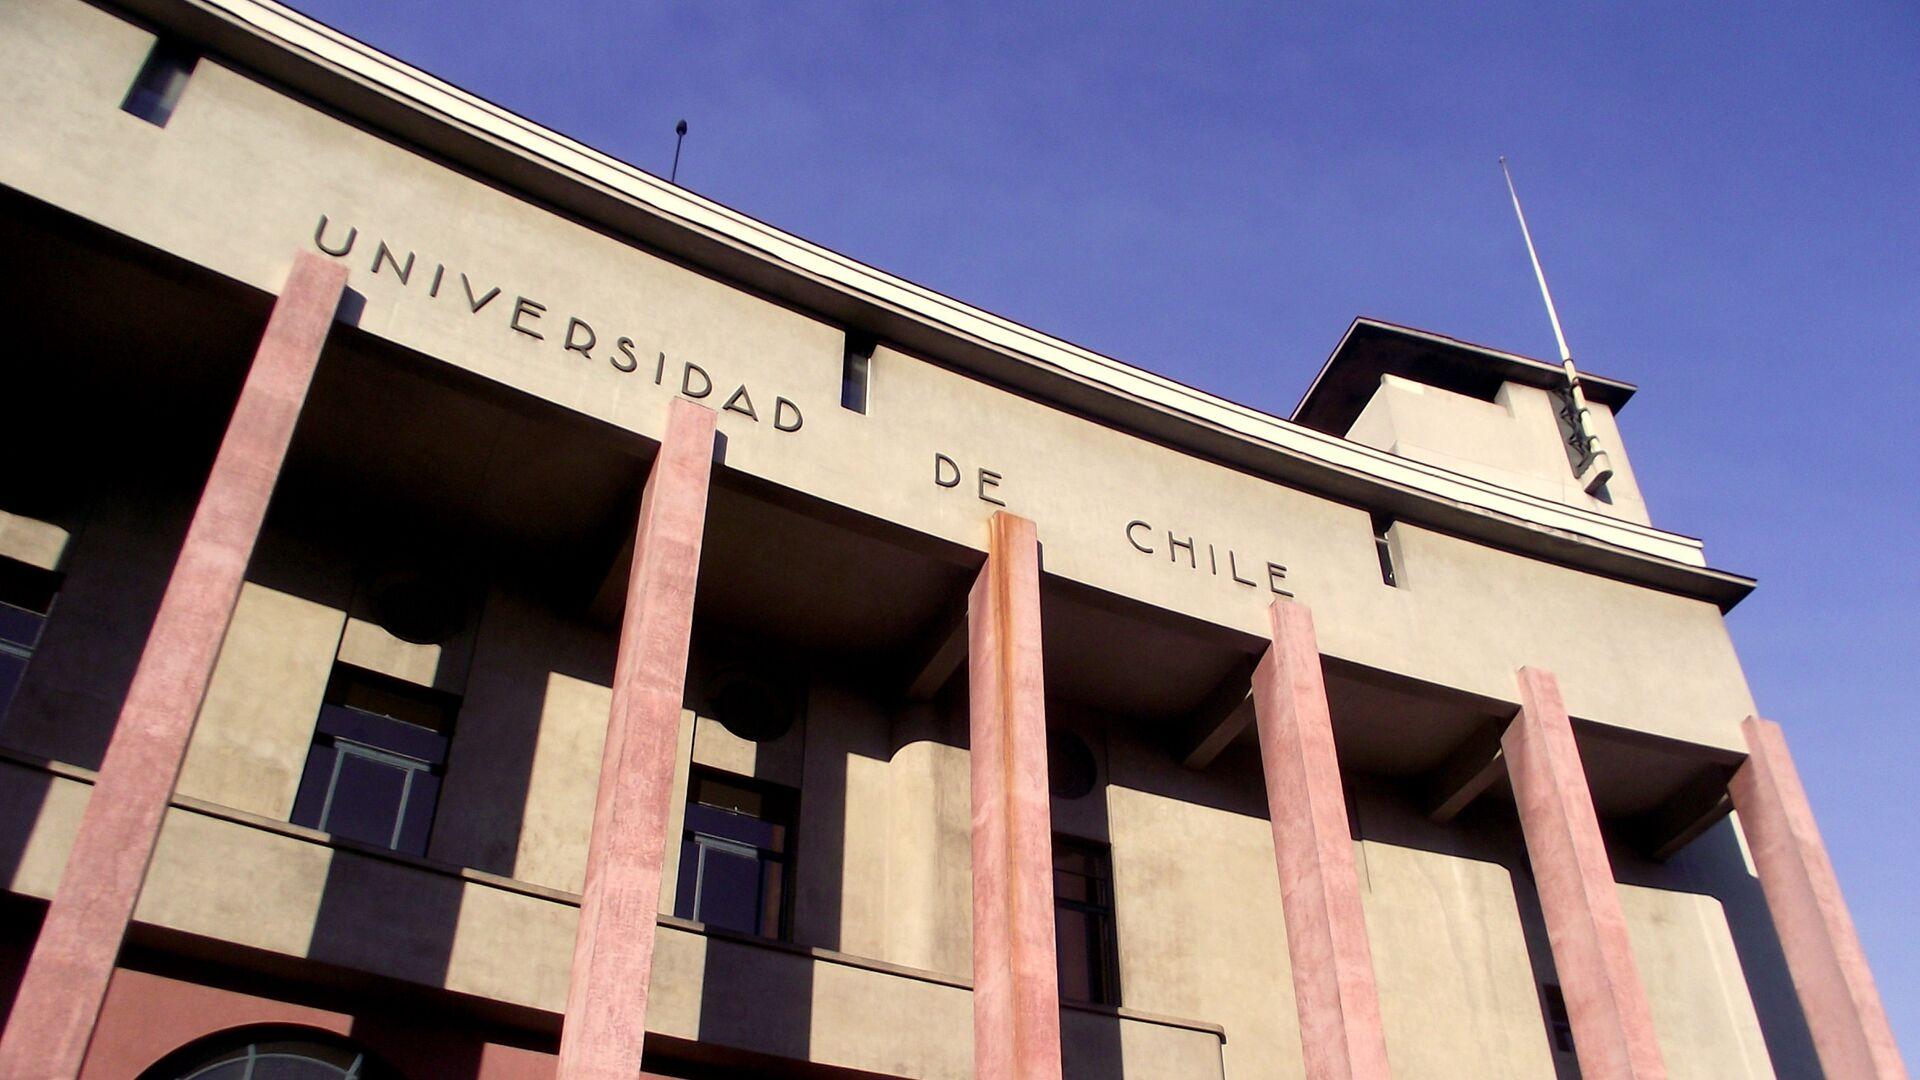 Universidad de Chile - Sputnik Mundo, 1920, 16.08.2021